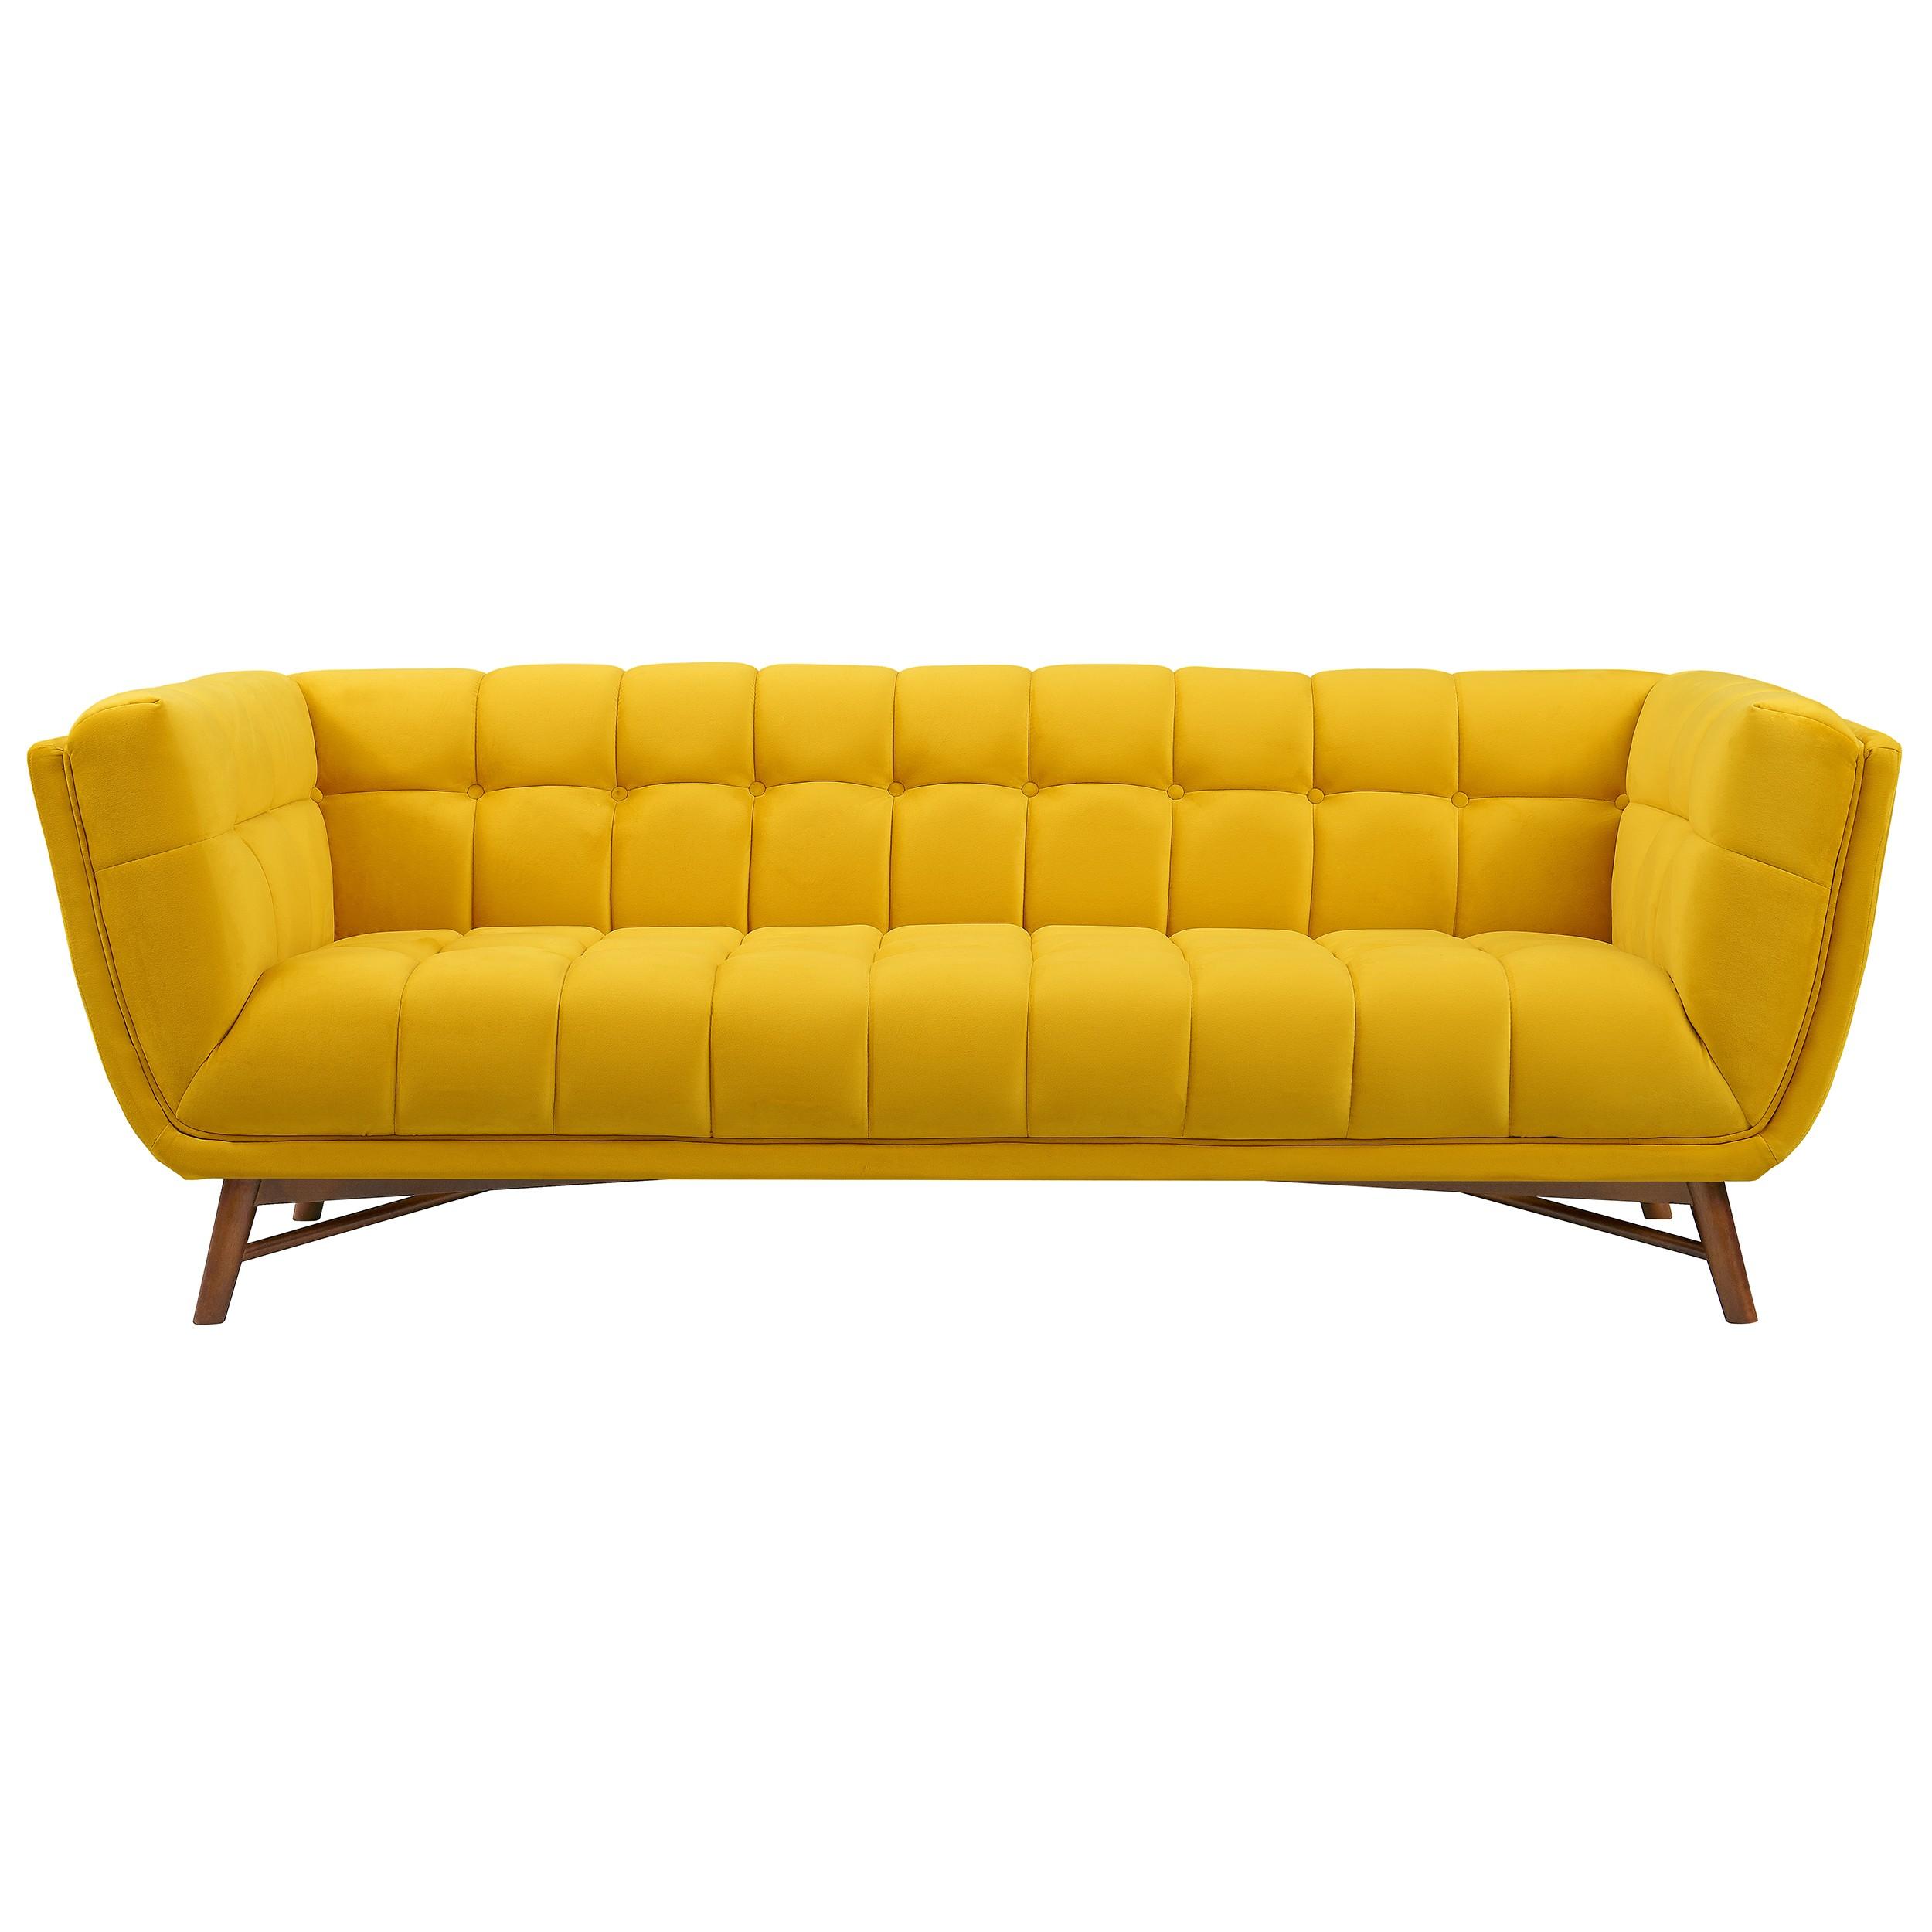 acheter canape jaune en velours